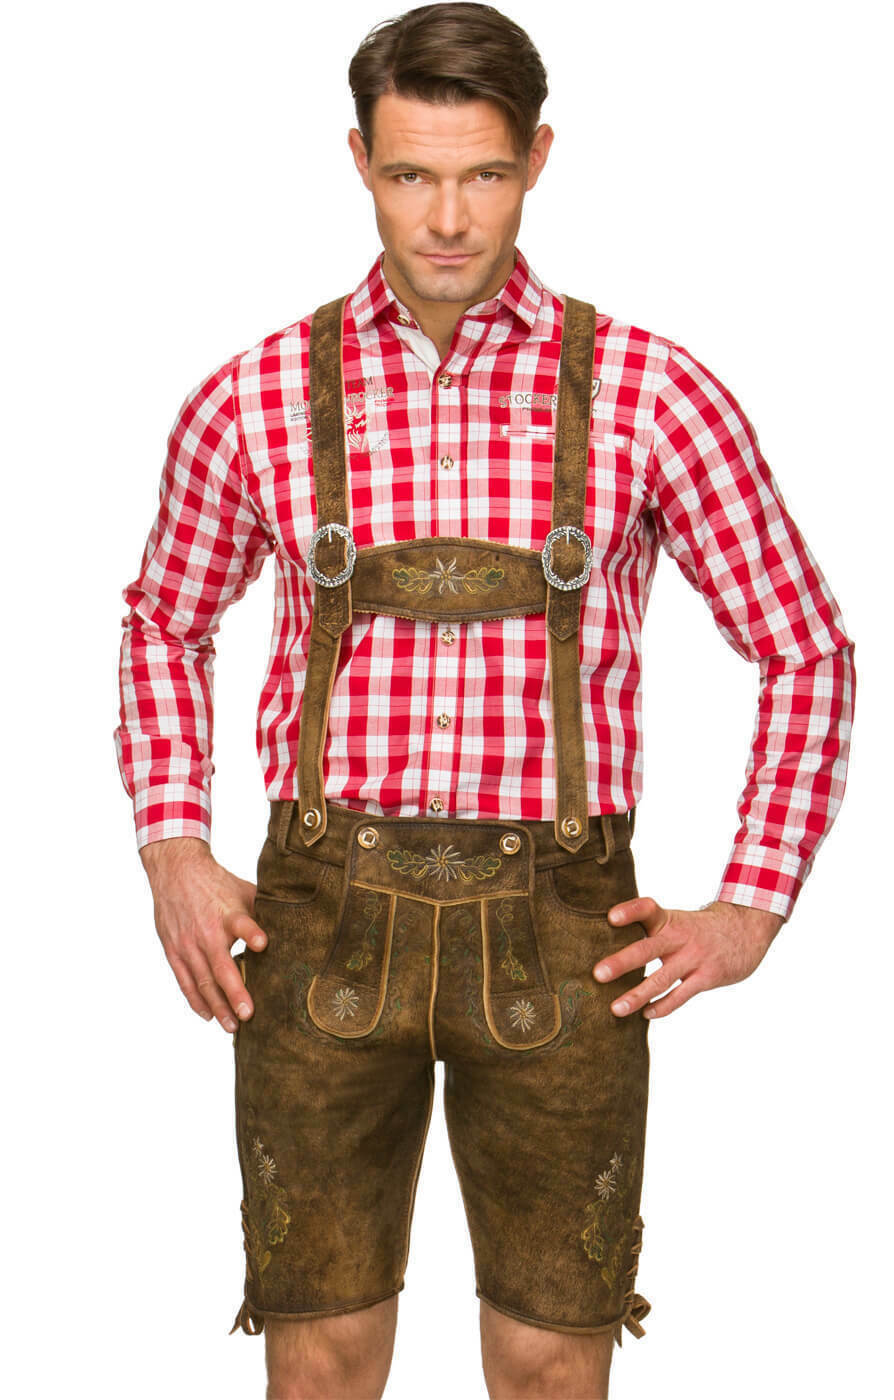 Pantalon en cuir bretelles en biberantik H Fesl biberantik en 6d8b00